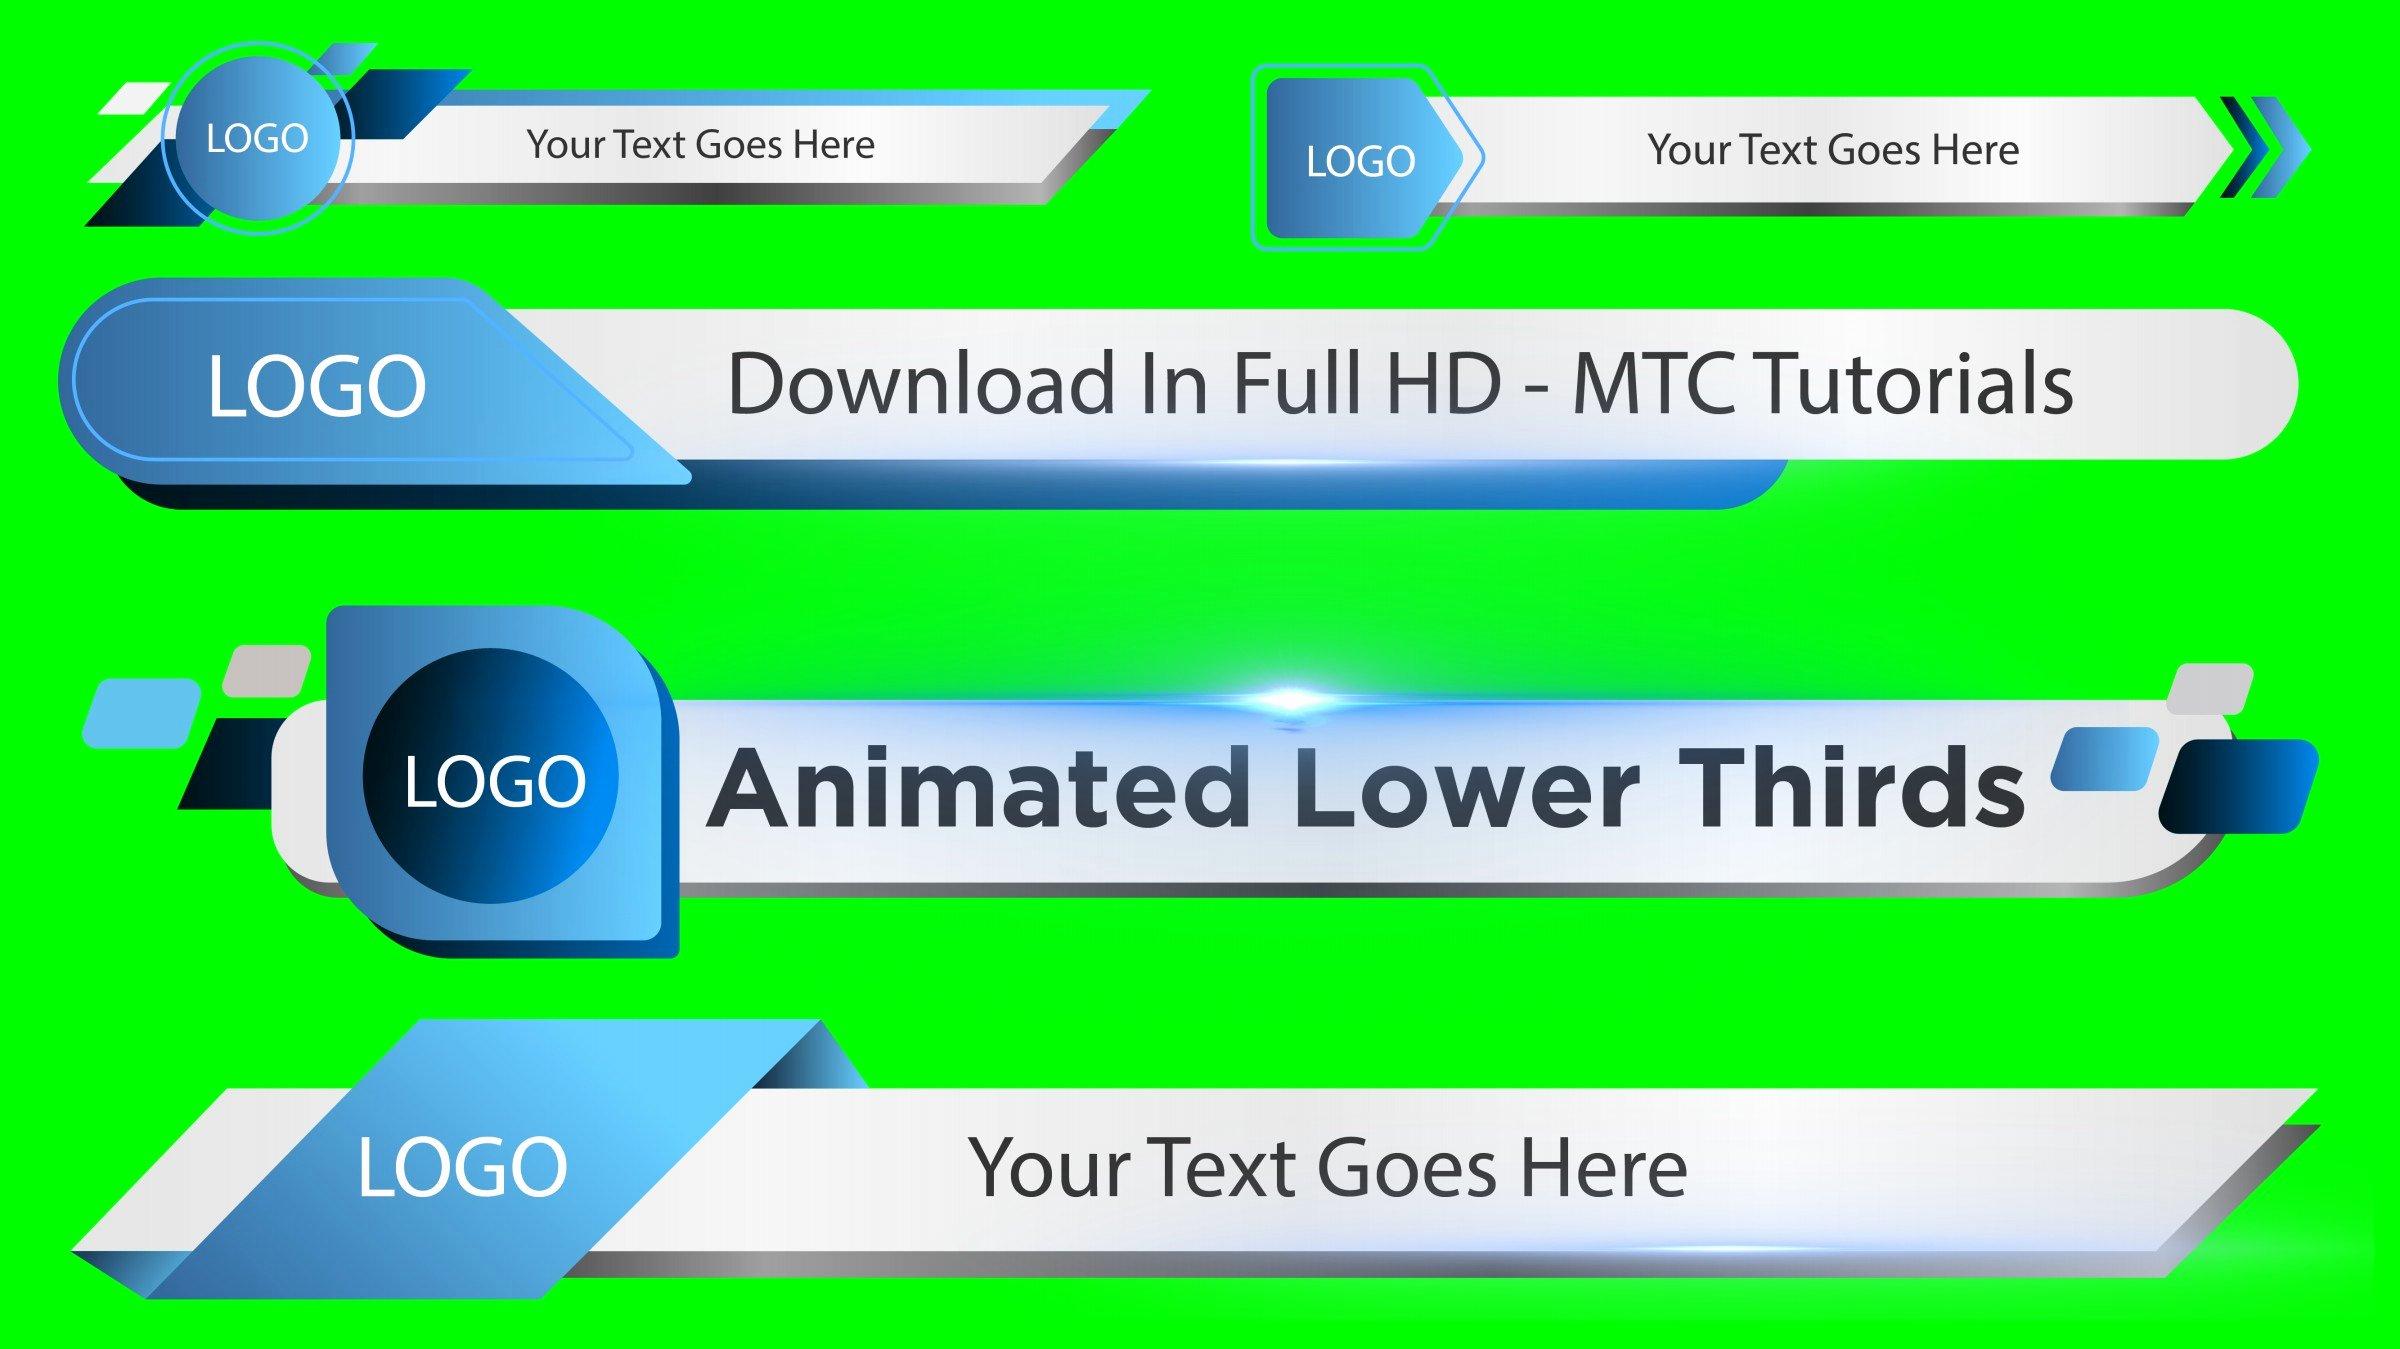 Free Lower Third Templates Photoshop Fresh Lower Third Templates Free Download